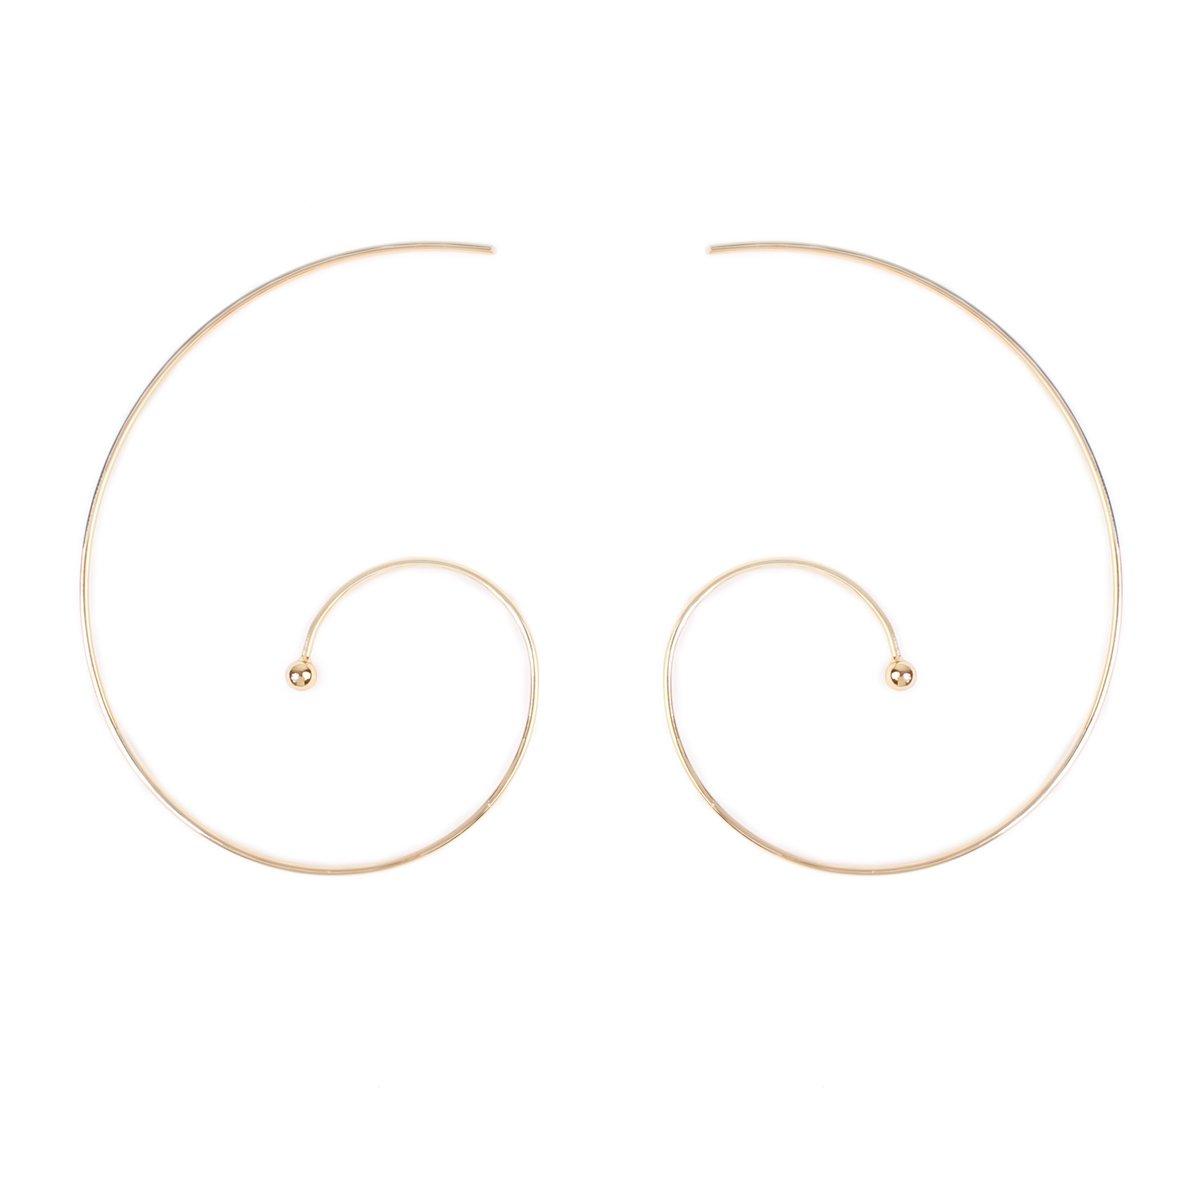 RIAH FASHION Lightweight Geometric Hoop Earrings - Classic Brass Wire Threader Dangles (Swirl Gold)